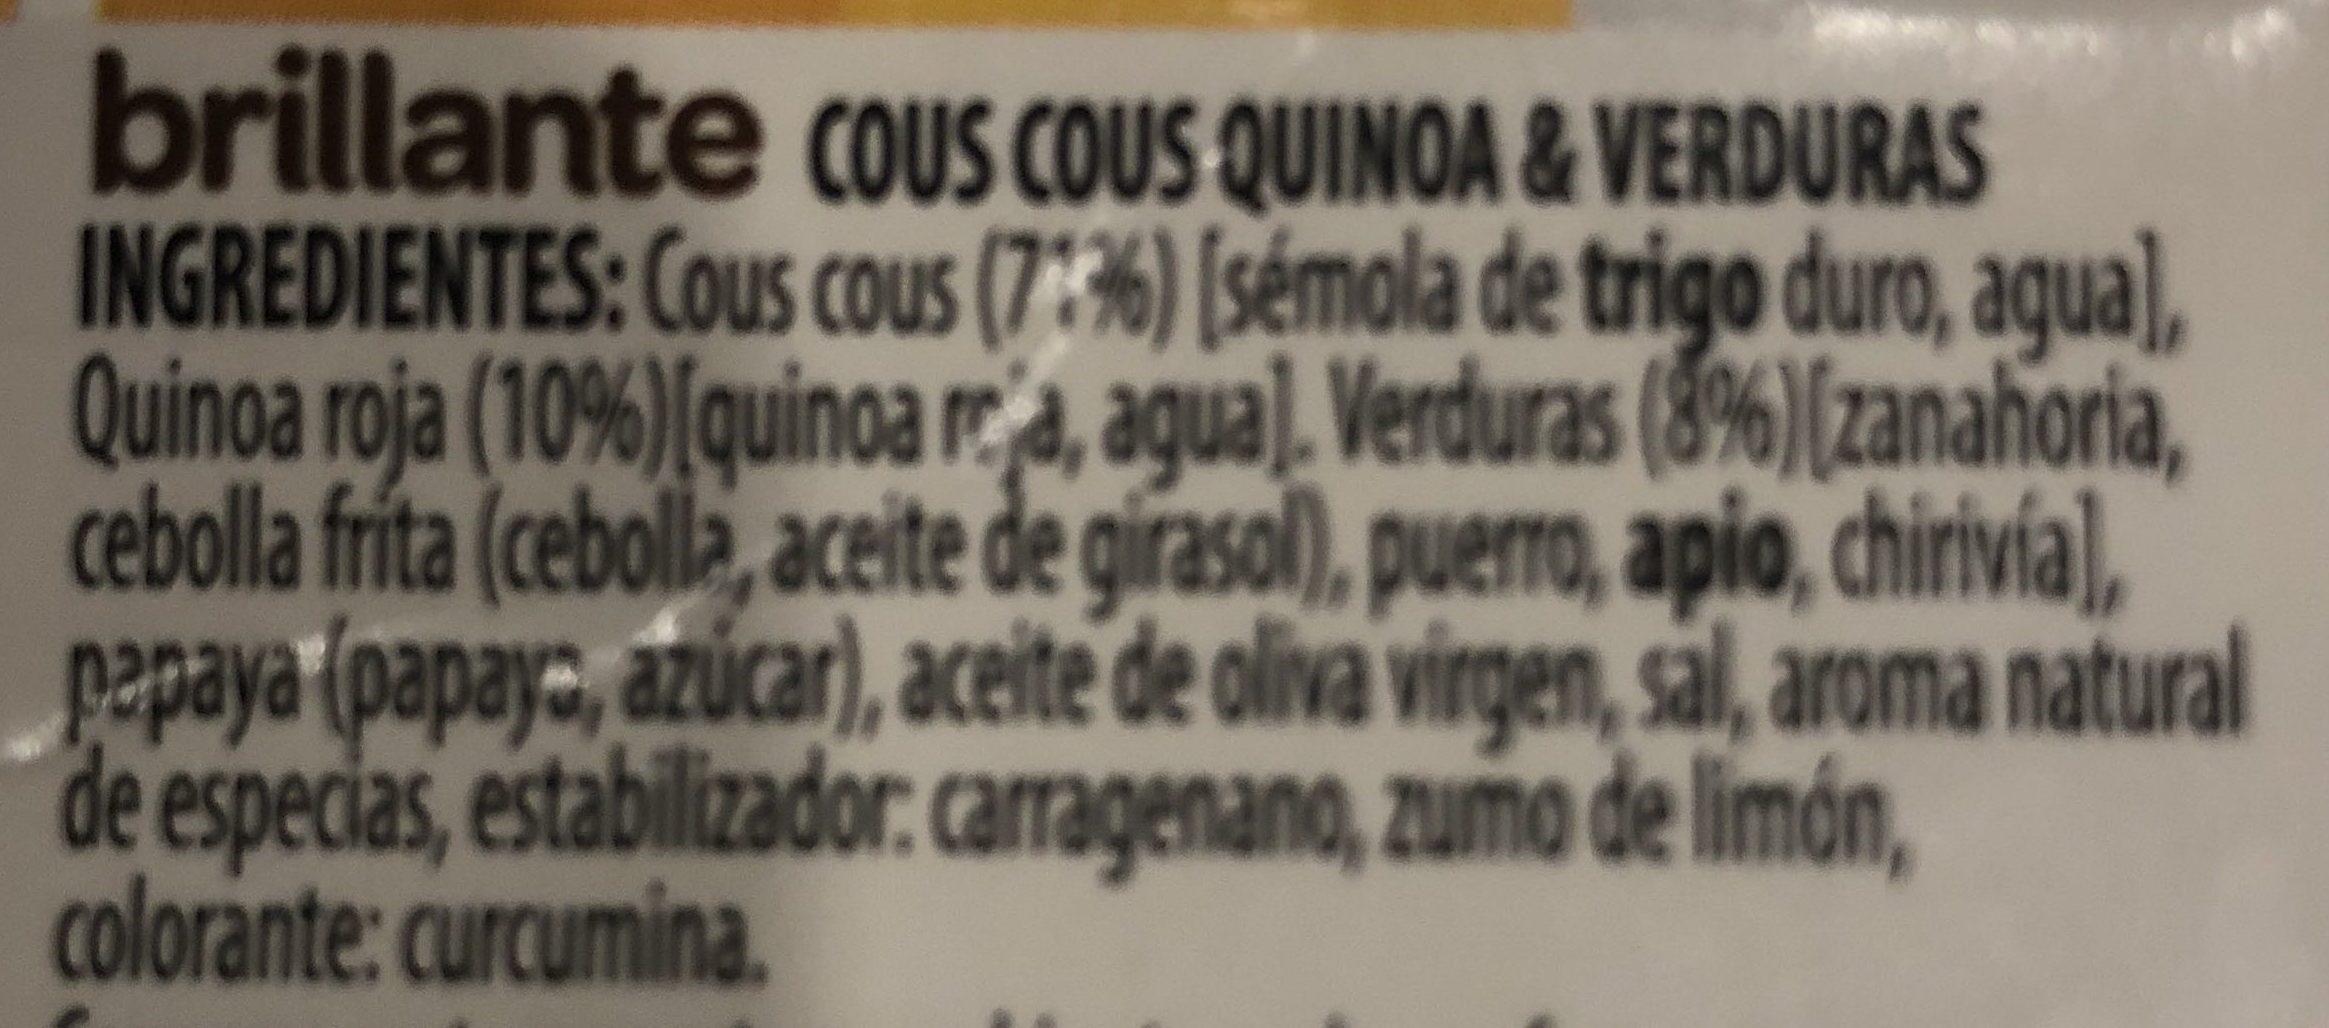 Benefit cous cous quinoa verduras - Ingredients - es